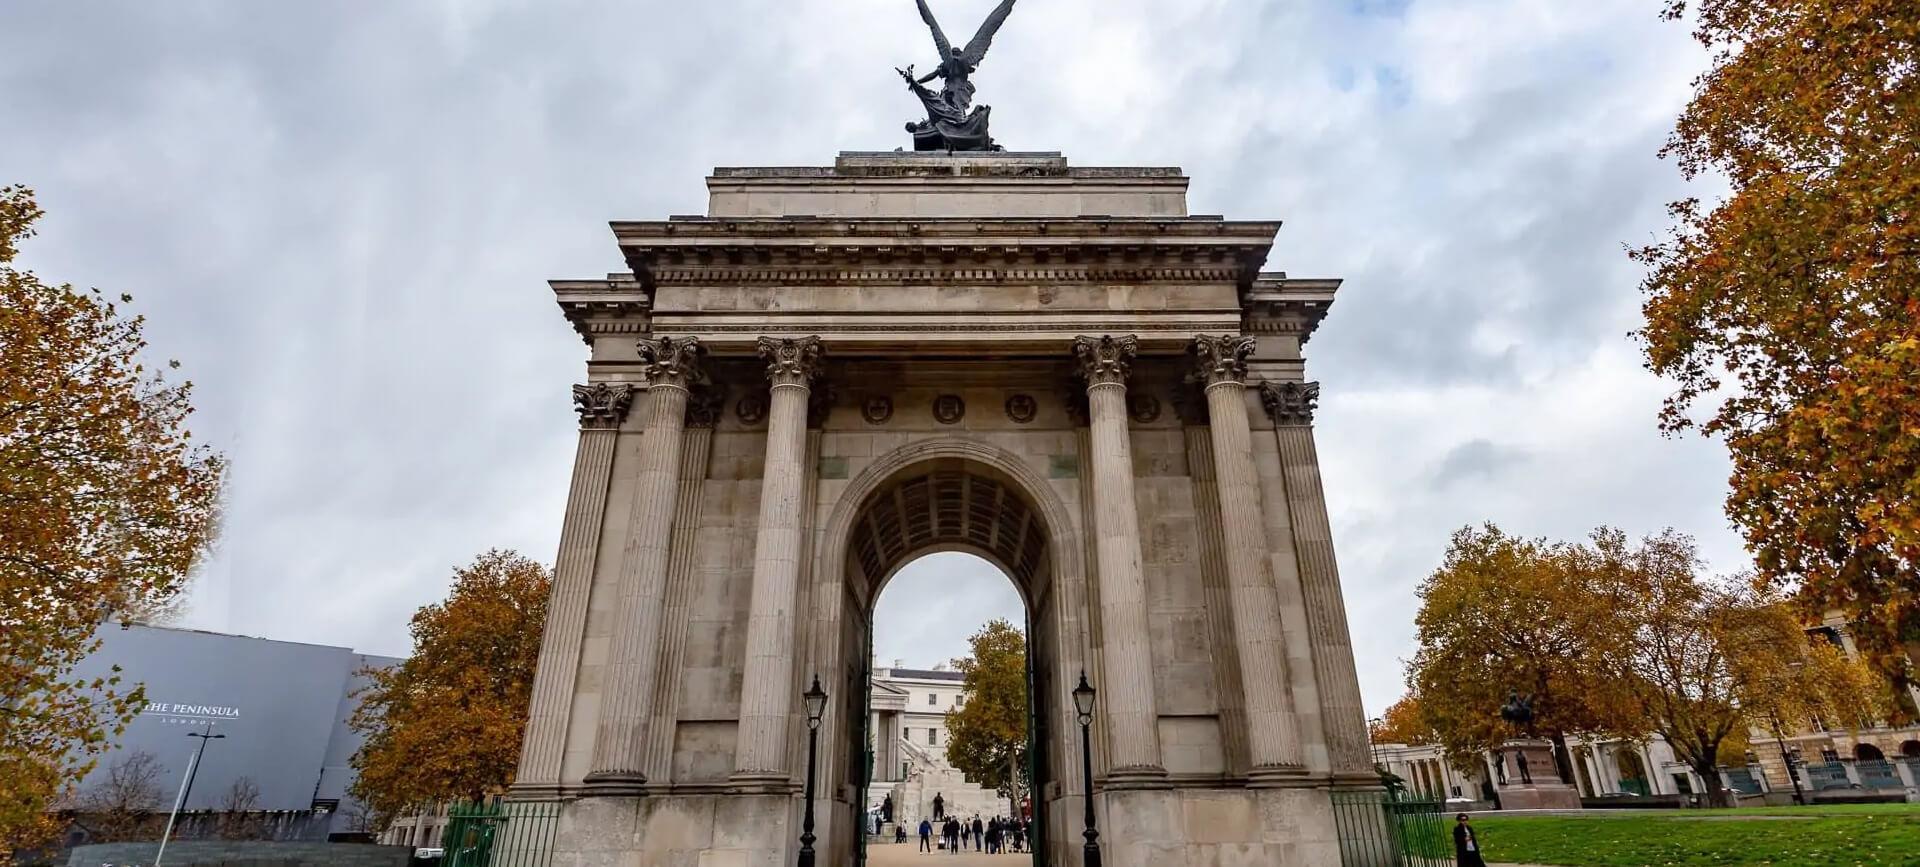 Wellington Arch in Mayfair, London